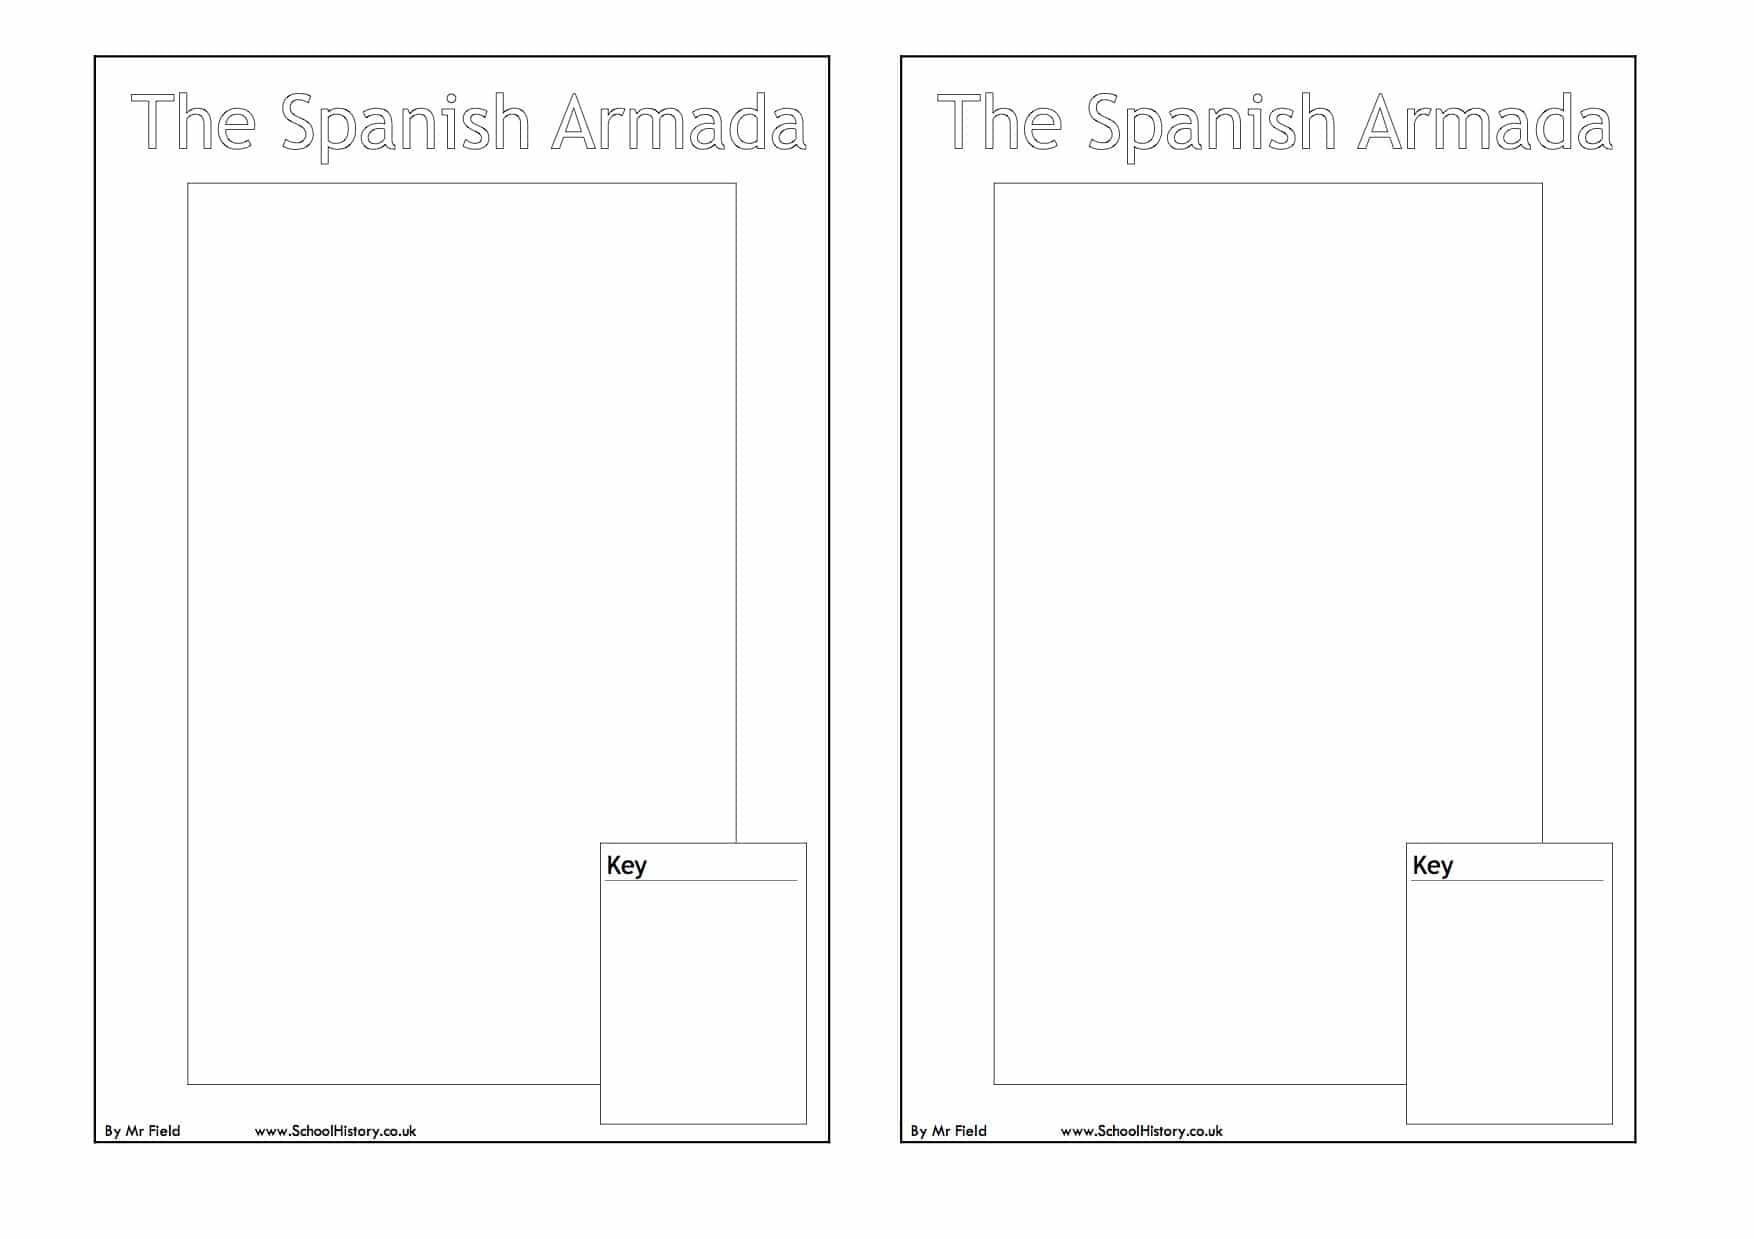 spanish armada map worksheet free blank map pdf. Black Bedroom Furniture Sets. Home Design Ideas